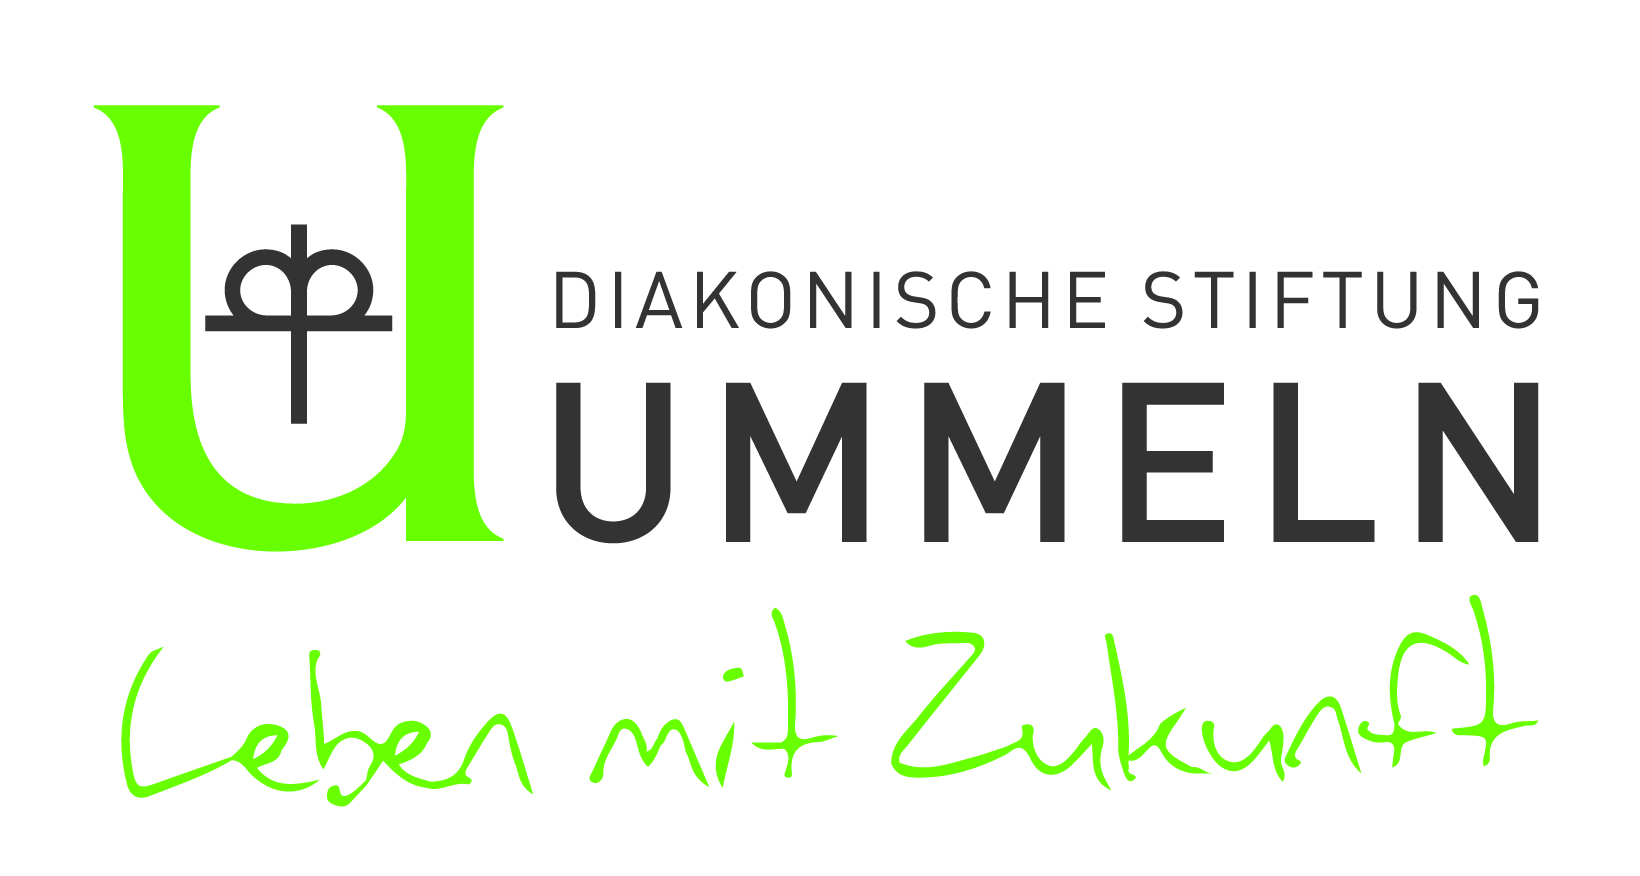 Logo: Diakonische Stiftung Ummeln